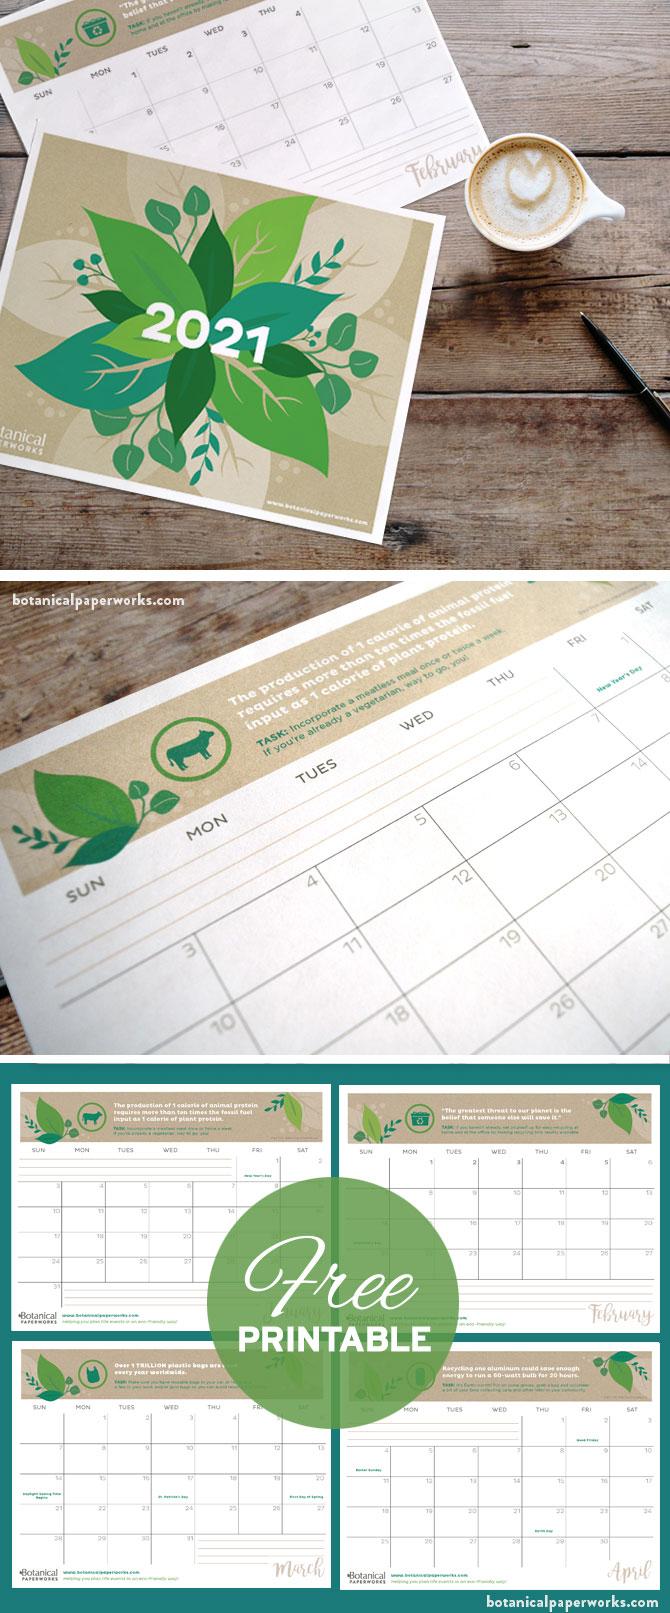 free printable eco tips calendar for 2021